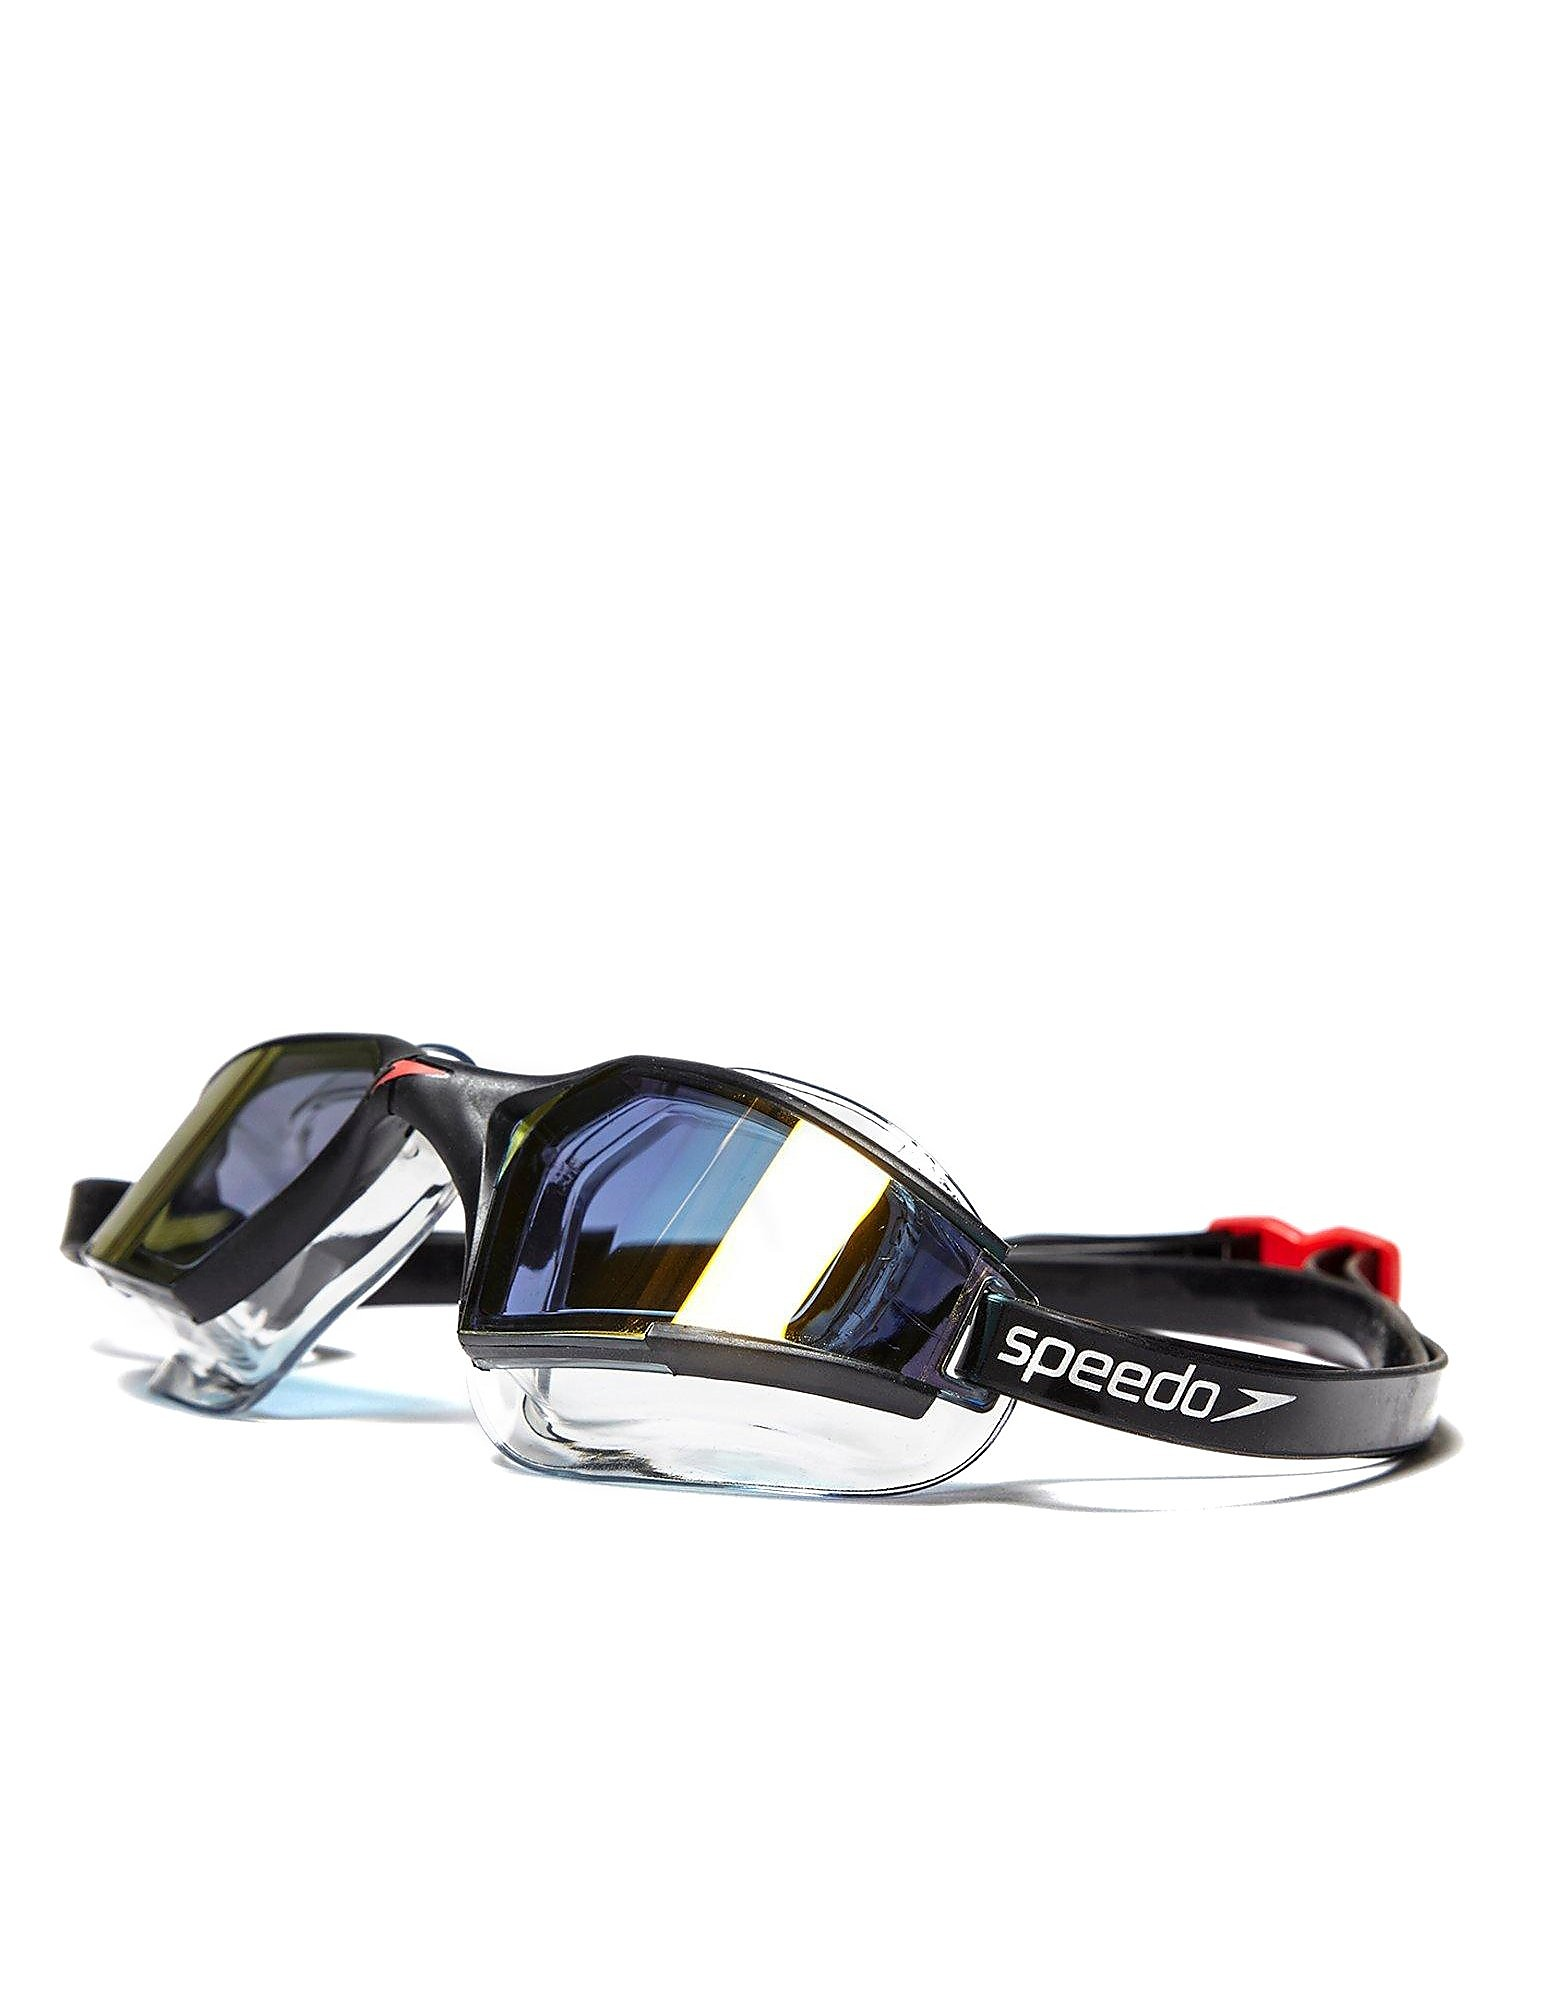 Speedo Lunettes de plongée Aquapulse Max Miror